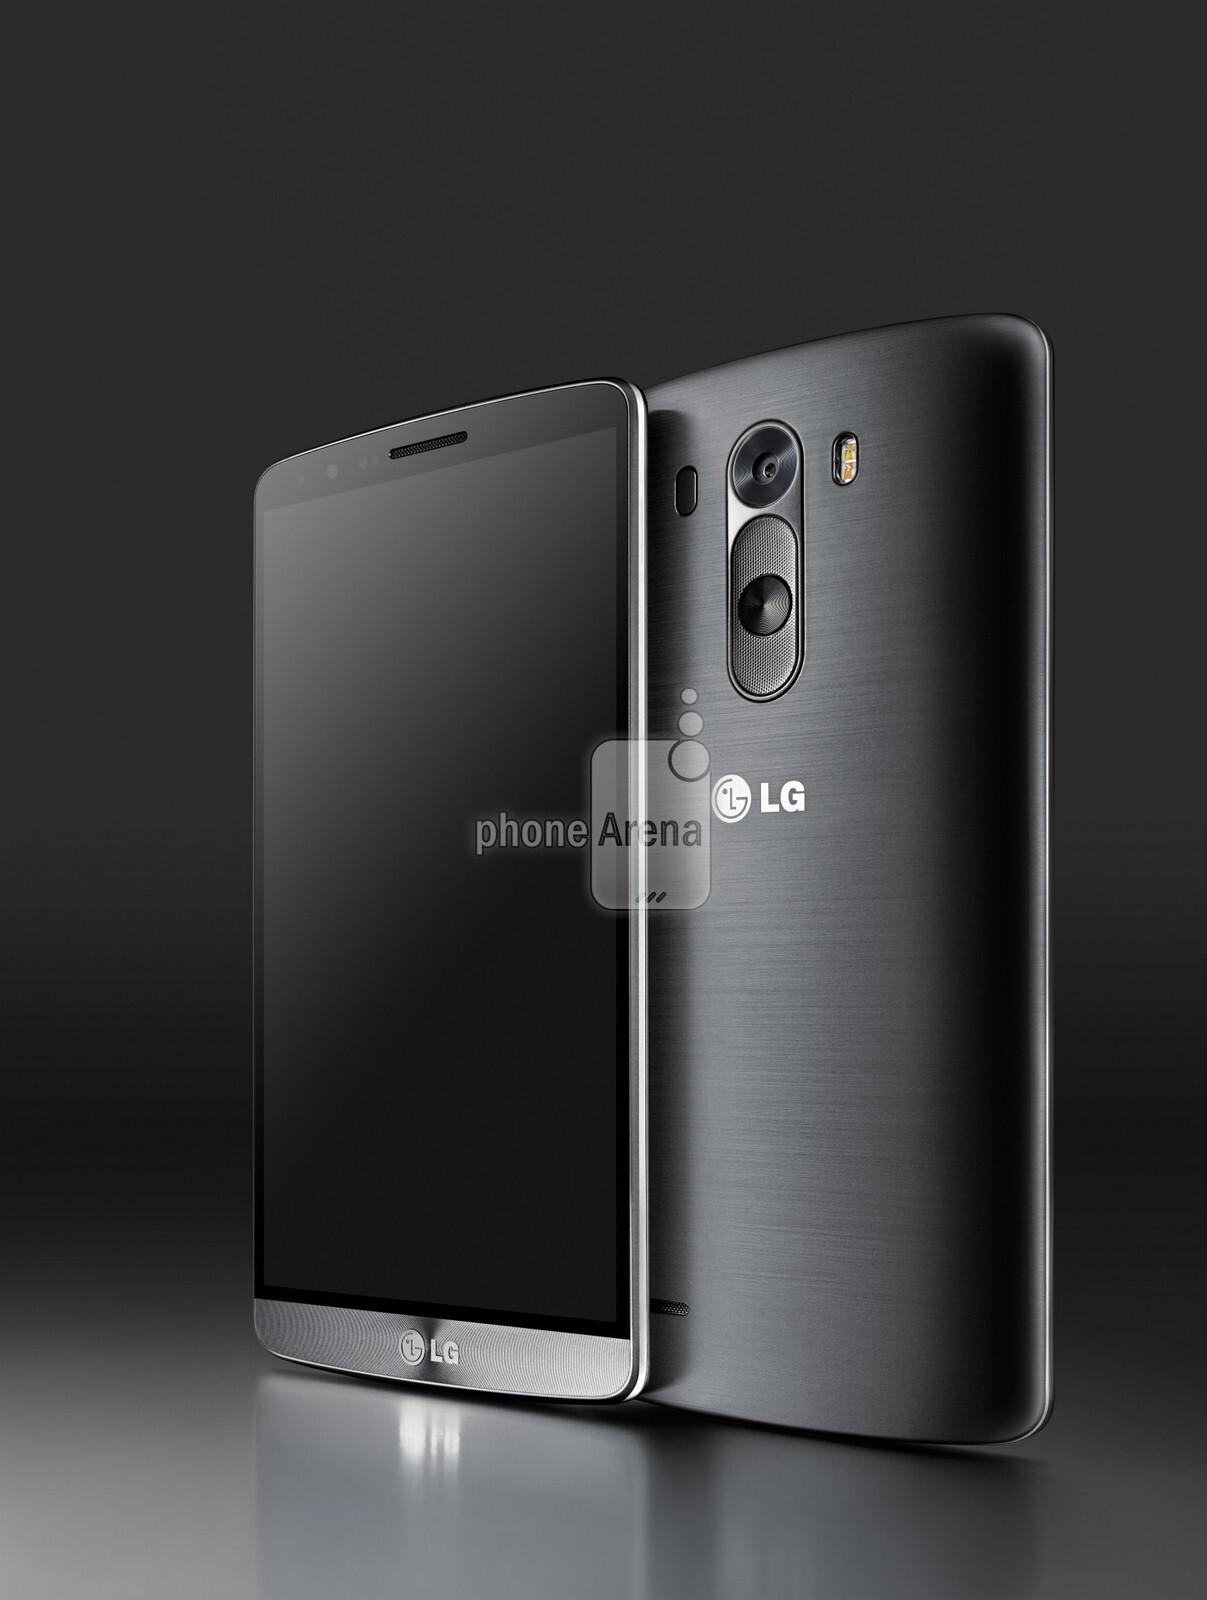 http://i-cdn.phonearena.com/images/articles/120687-image/LG-G3-press-renders-appear.jpg